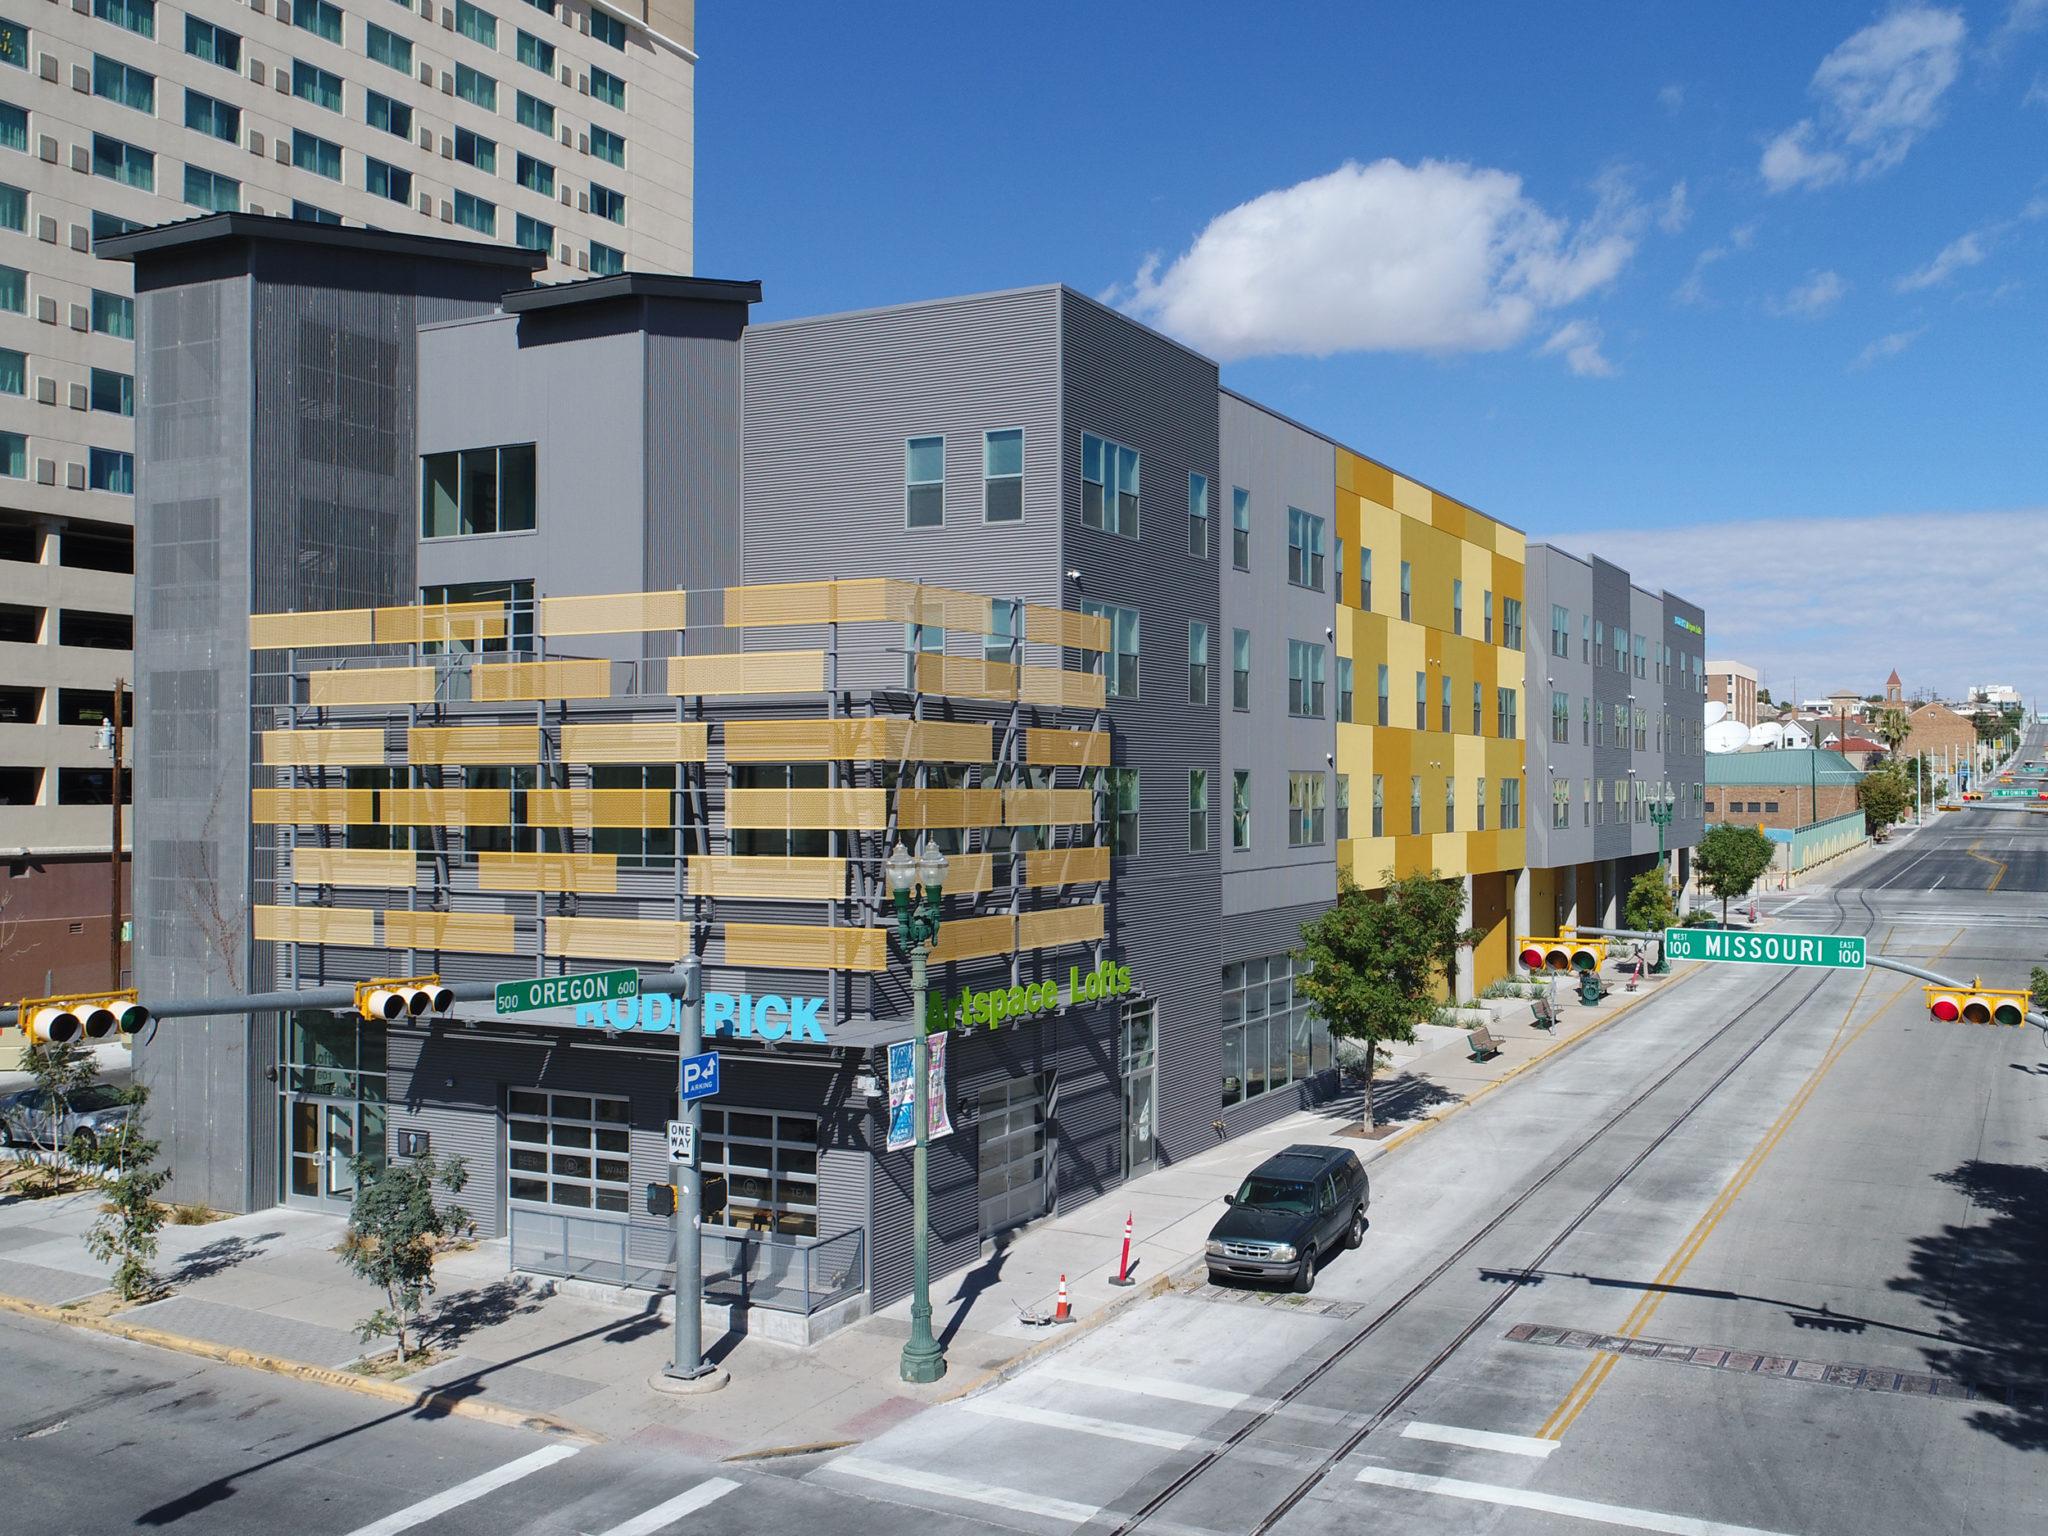 Roderick Artspace Lofts | HHL Architects